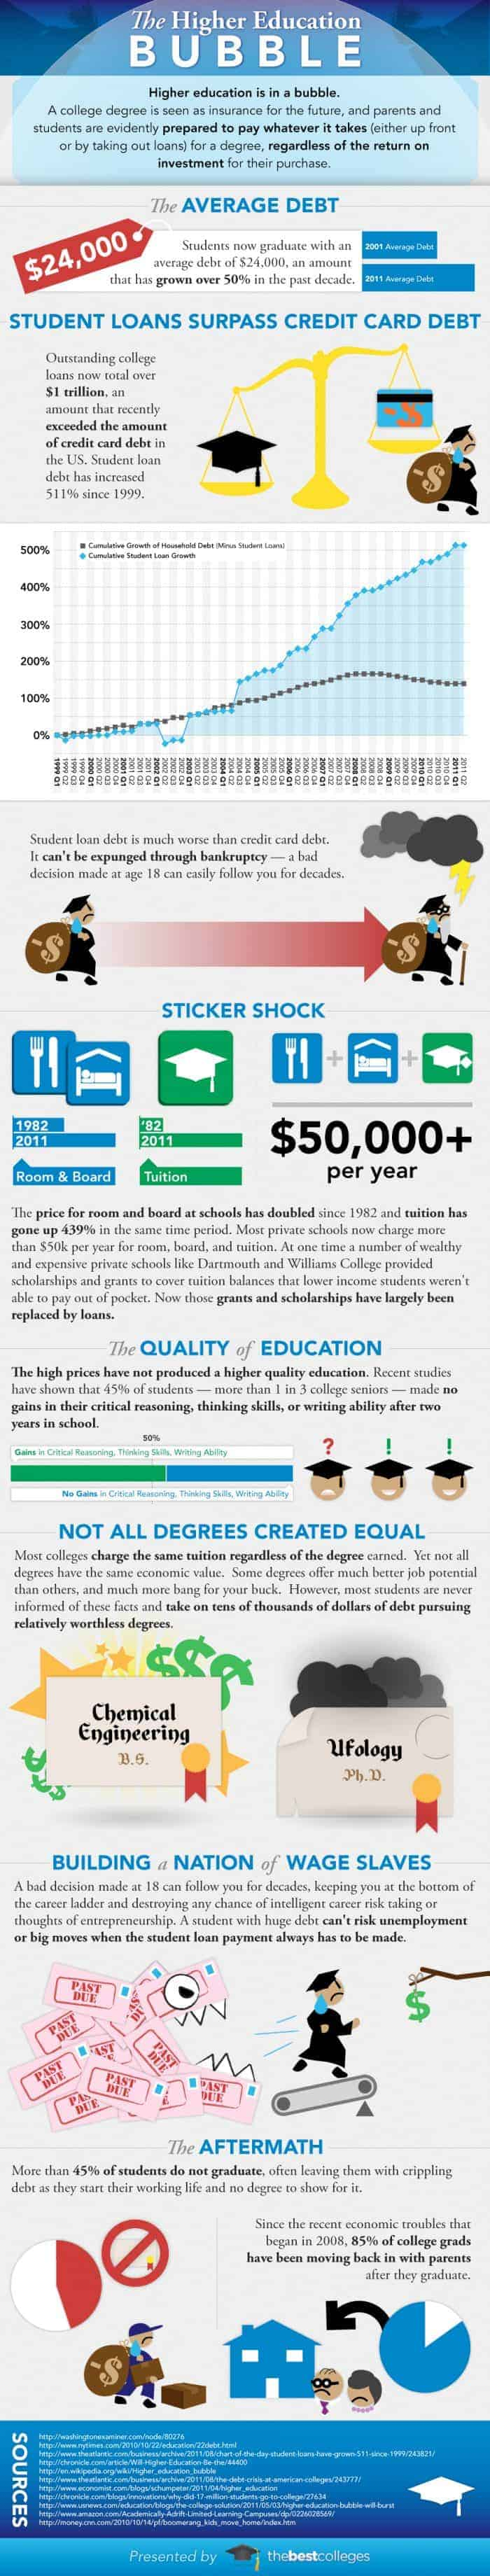 Higher Education Bubble